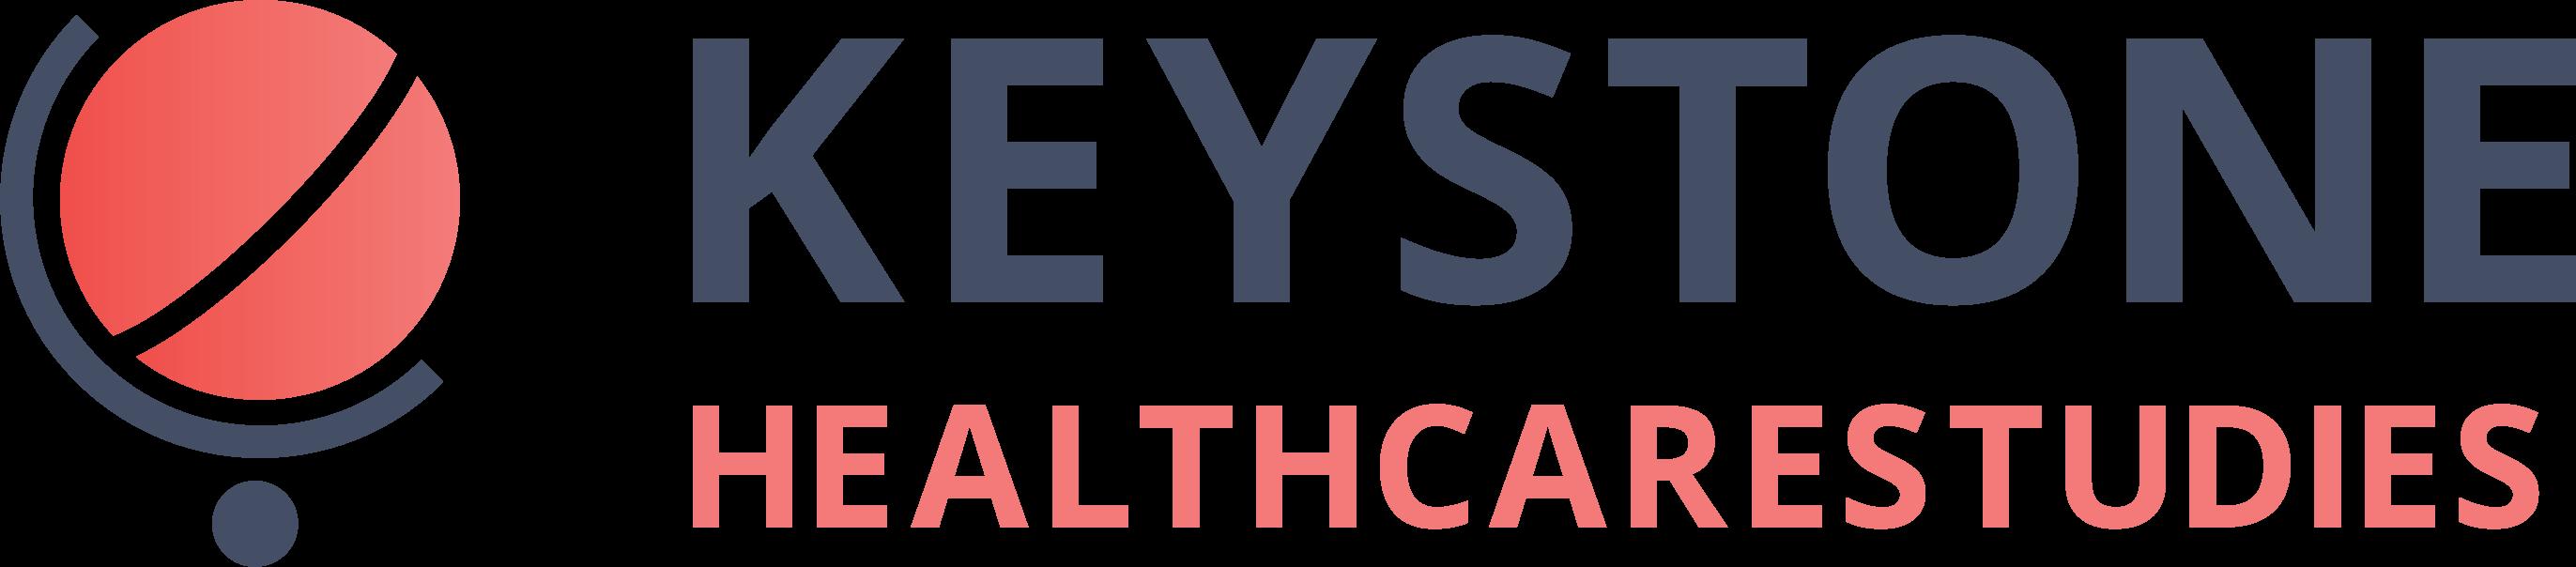 ks-healthcare